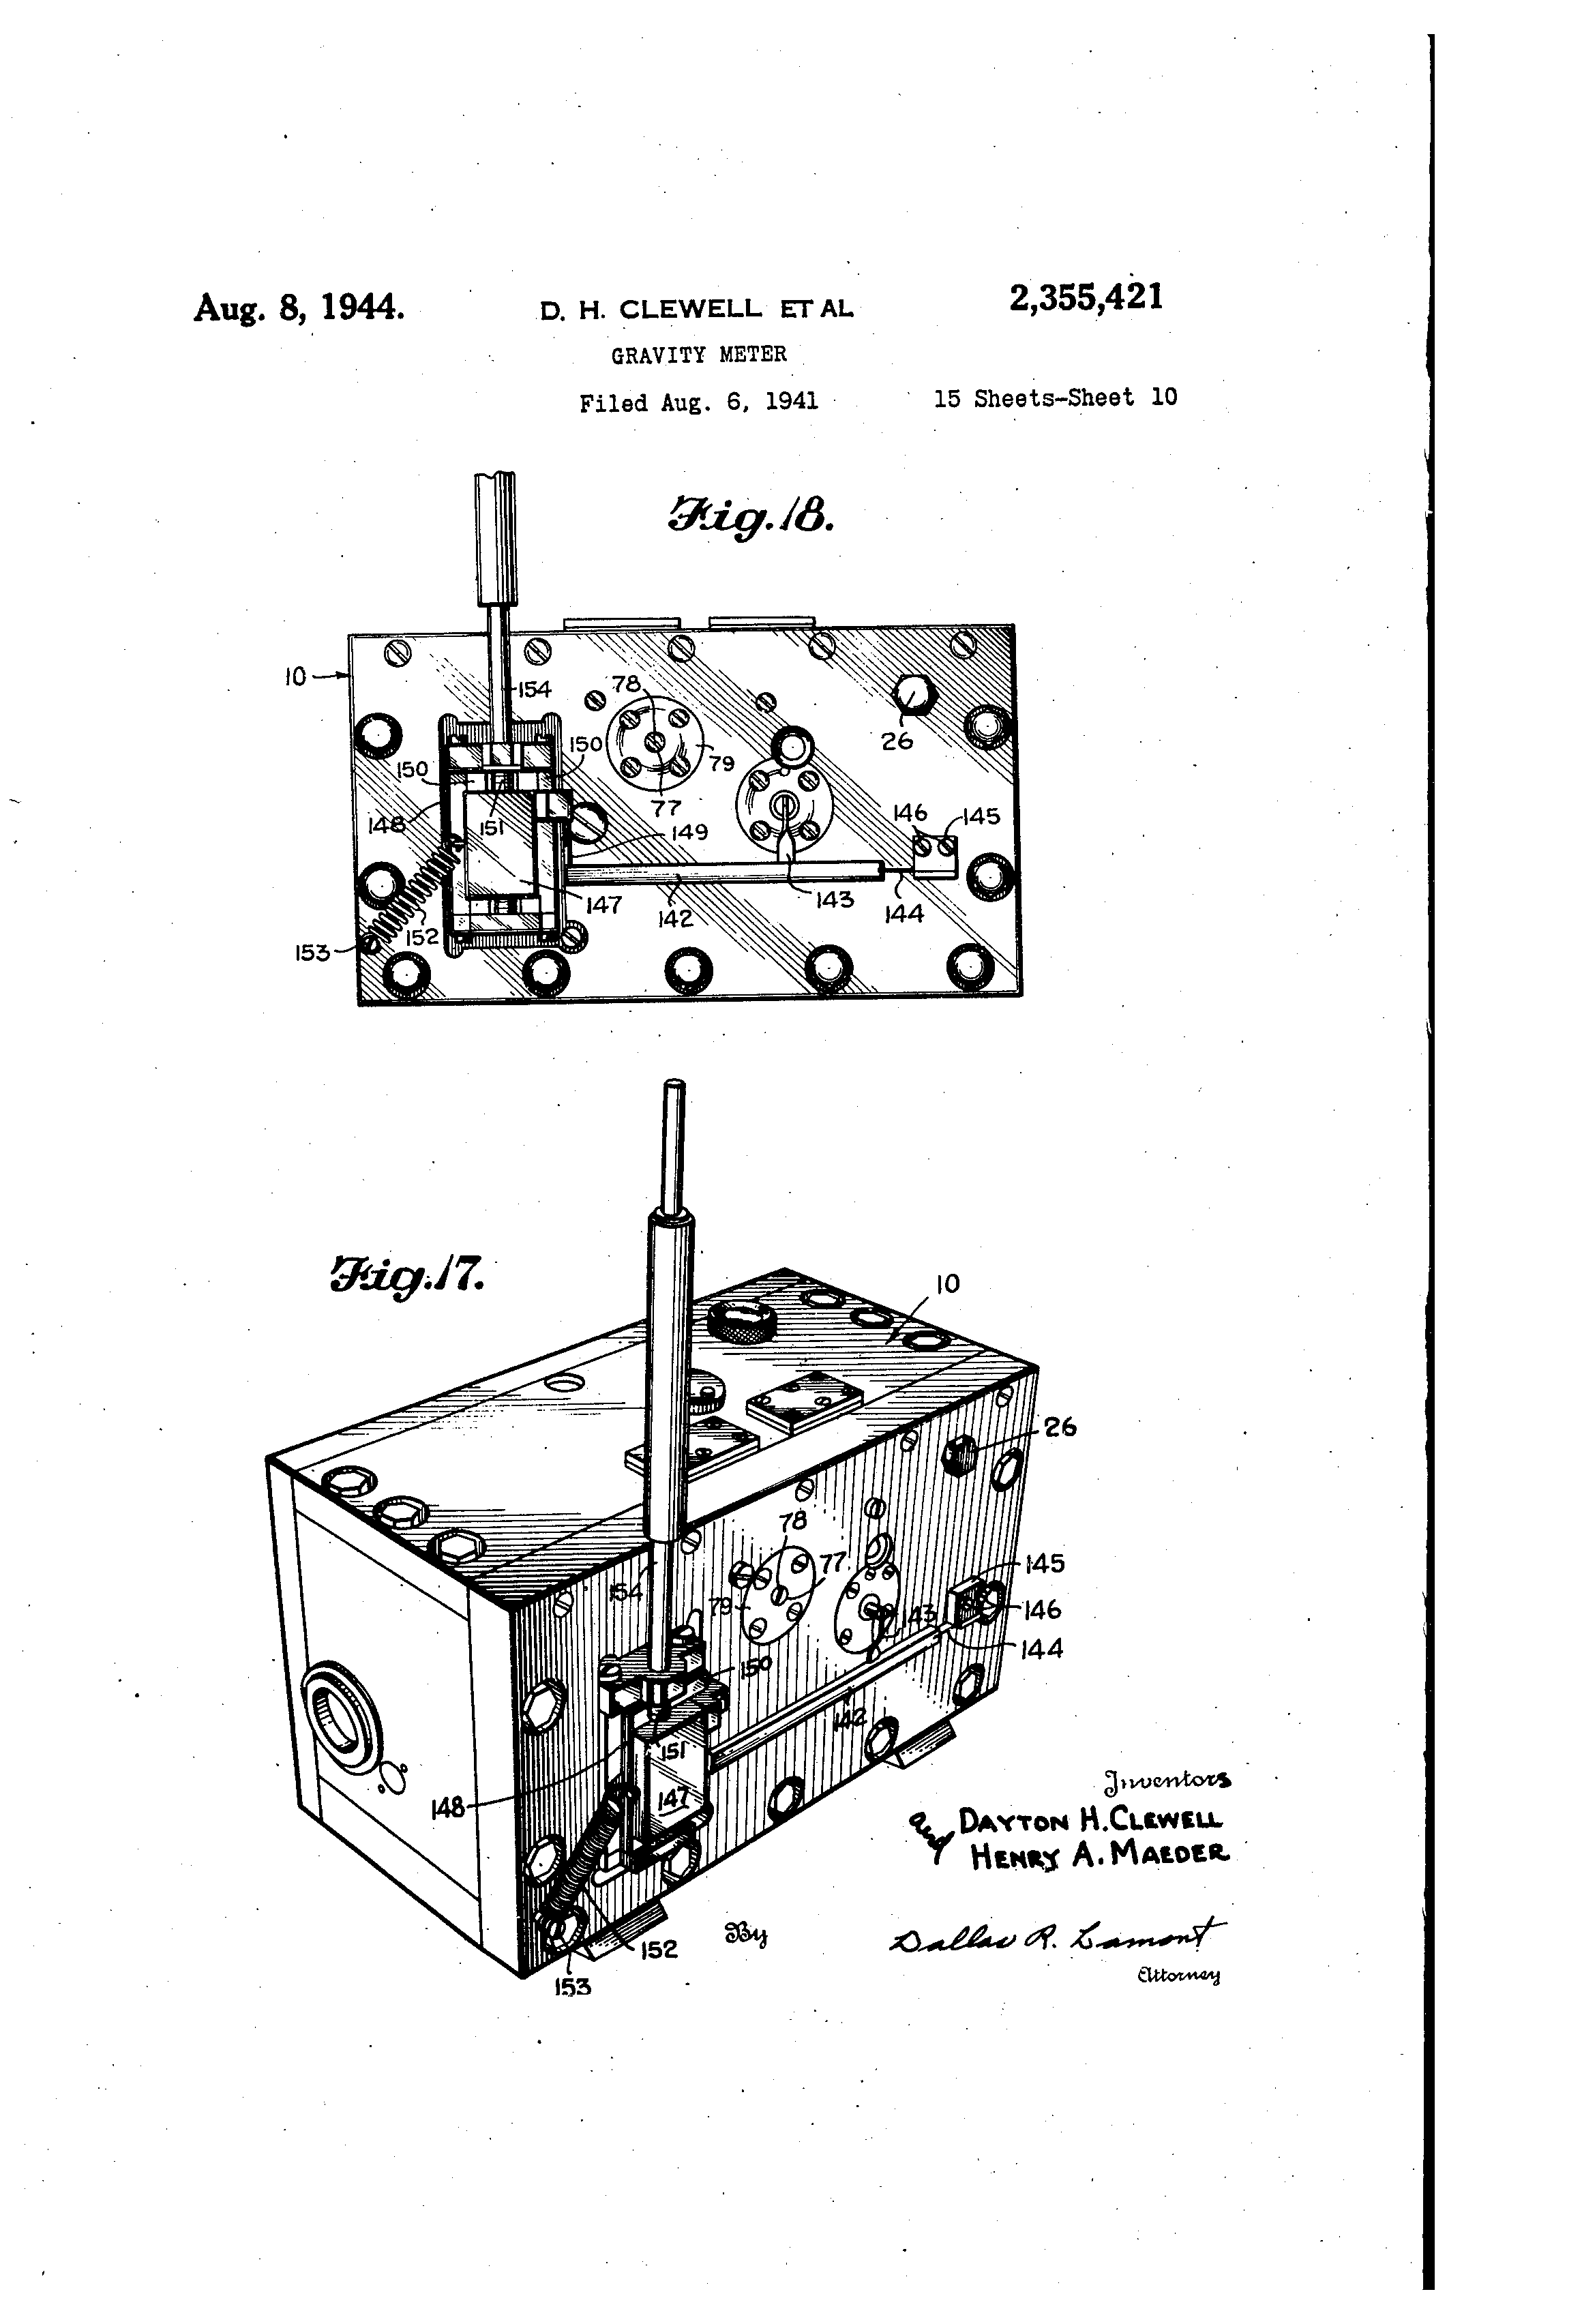 bc rich warlock guitar wiring photo album wire diagram images wiring diagram  in addition bc rich